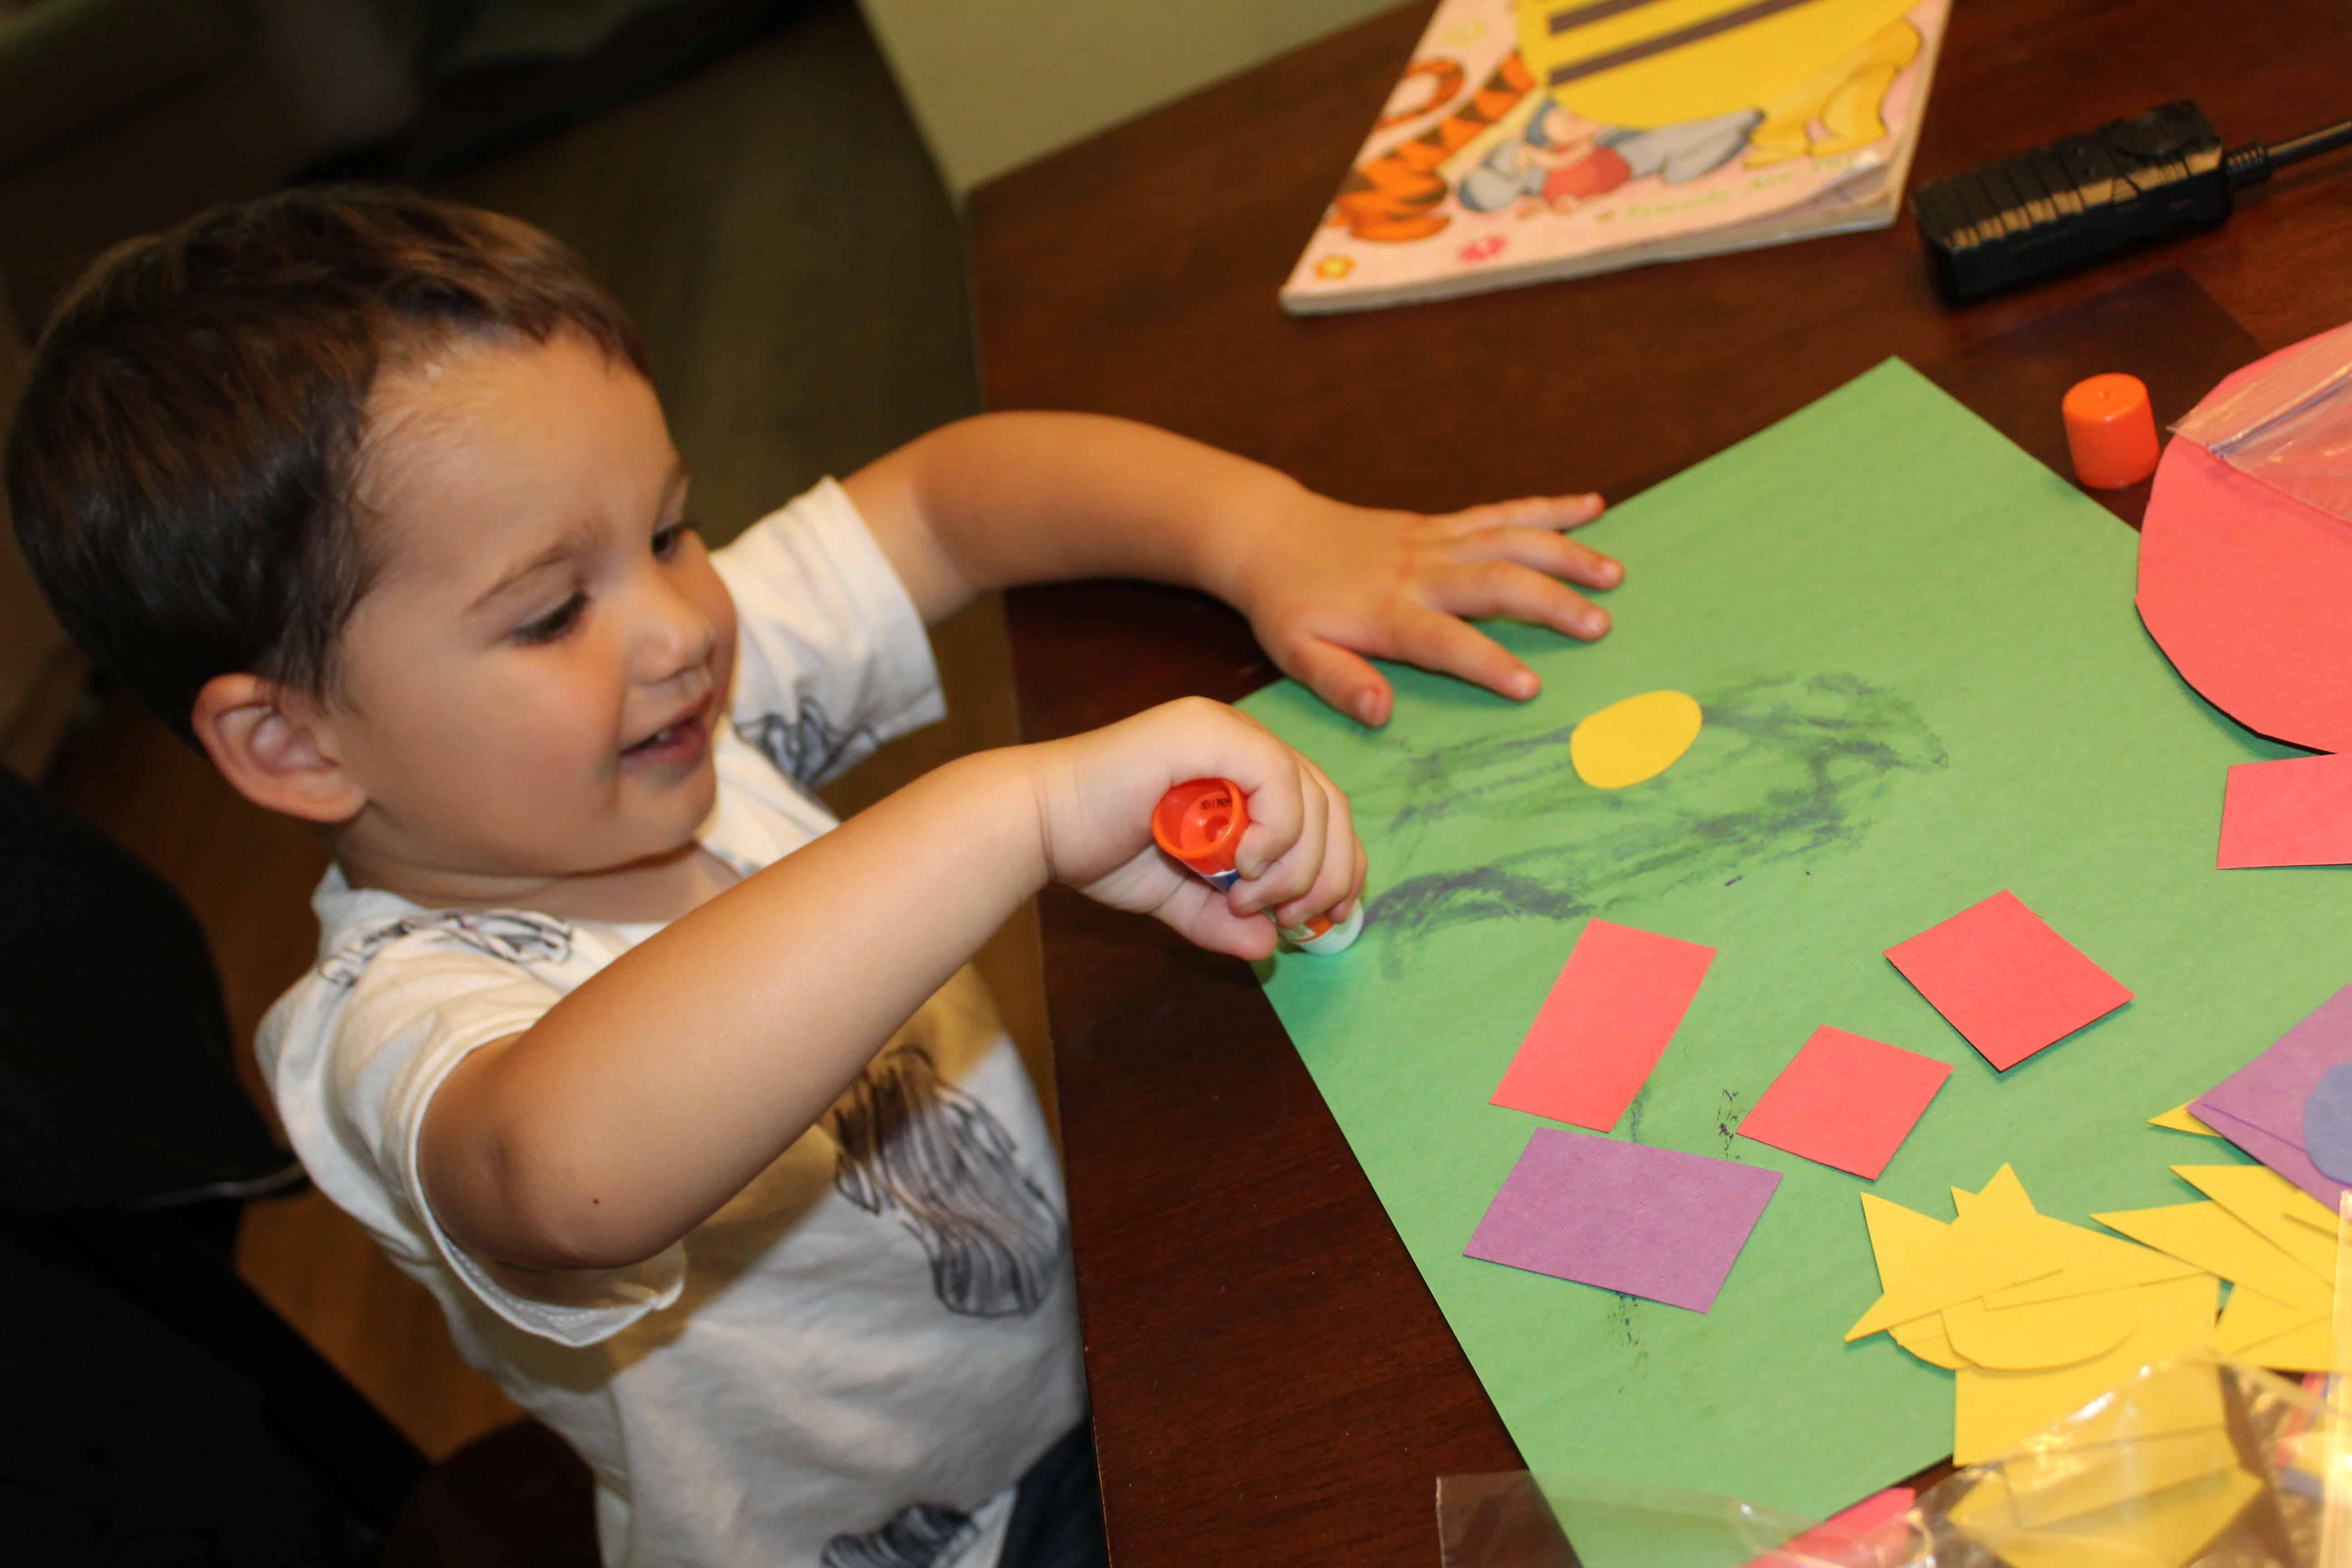 preschooler gluing construction paper shapes onto paper